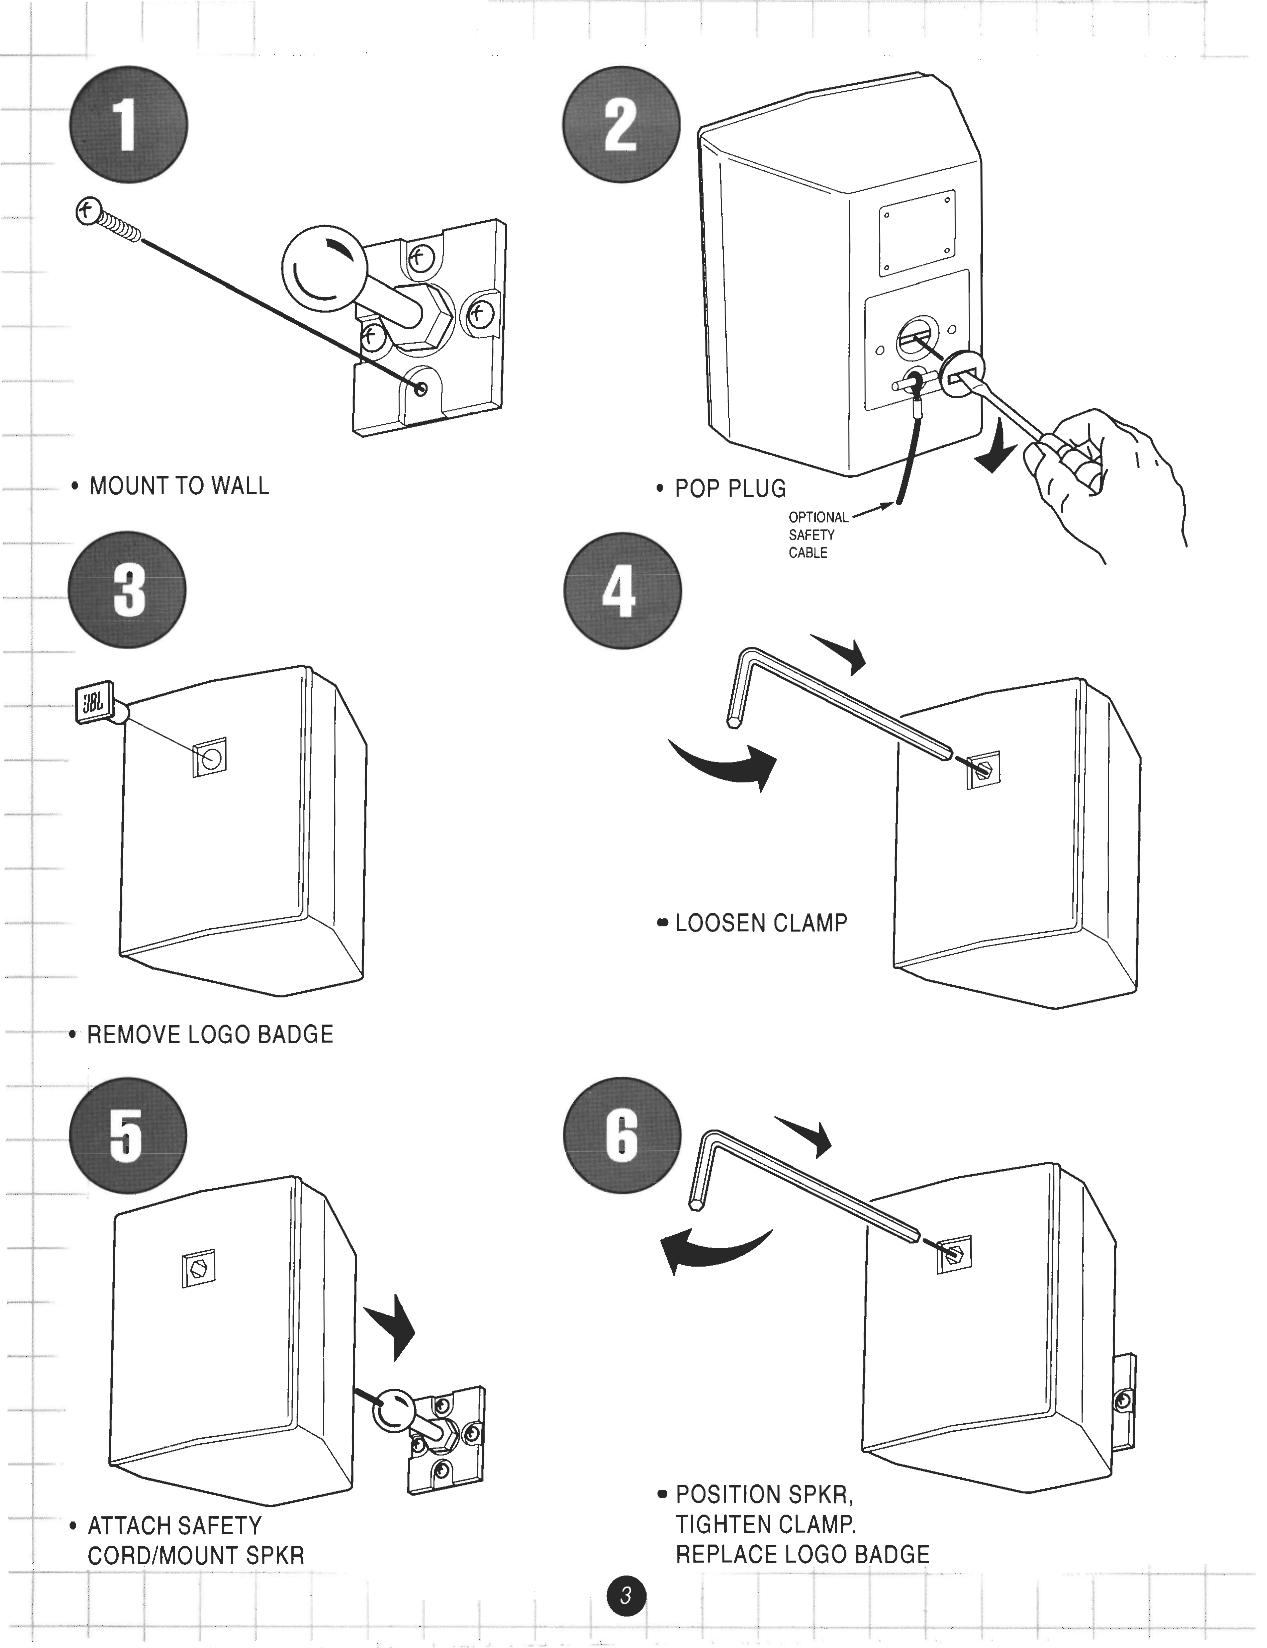 pdf manual for jbl speaker control control 23 rh umlib com jbl boombox instruction manual jbl flip 3 instruction manual